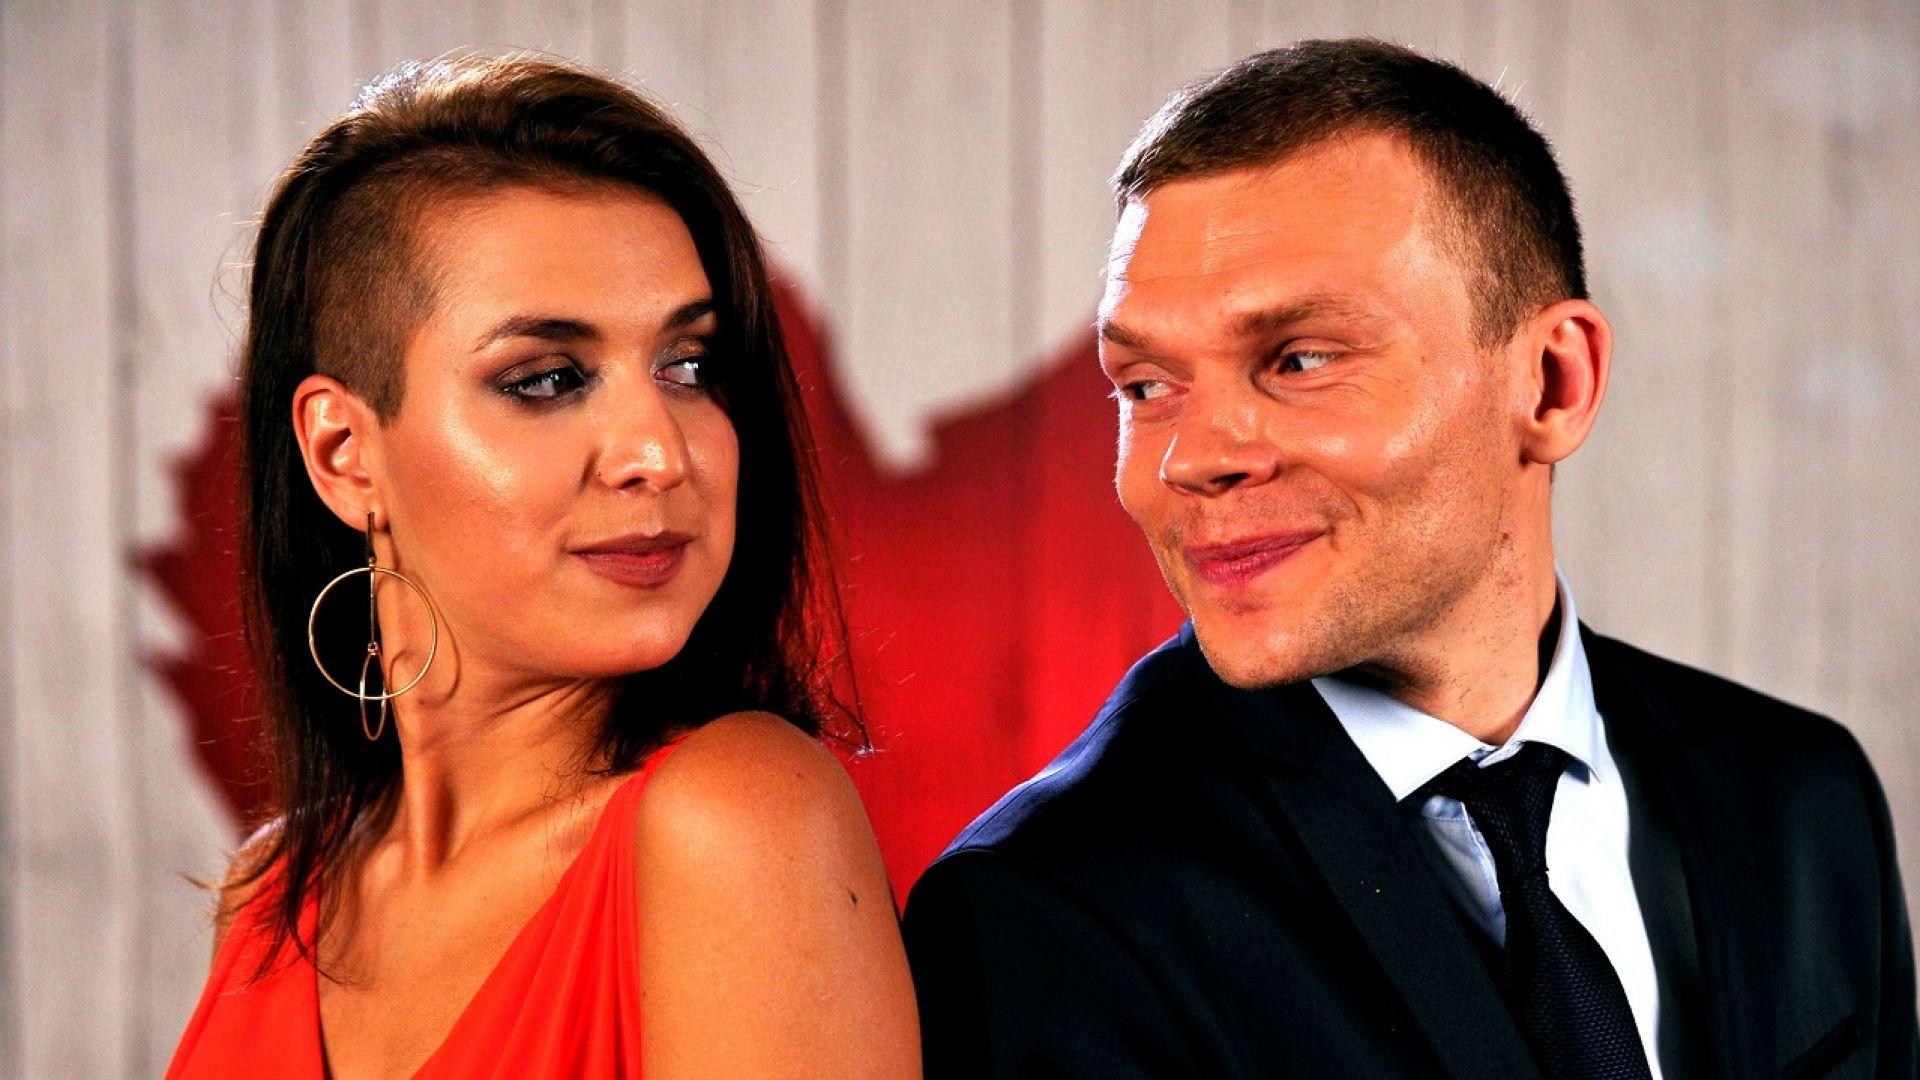 Kocham cie polsko online dating